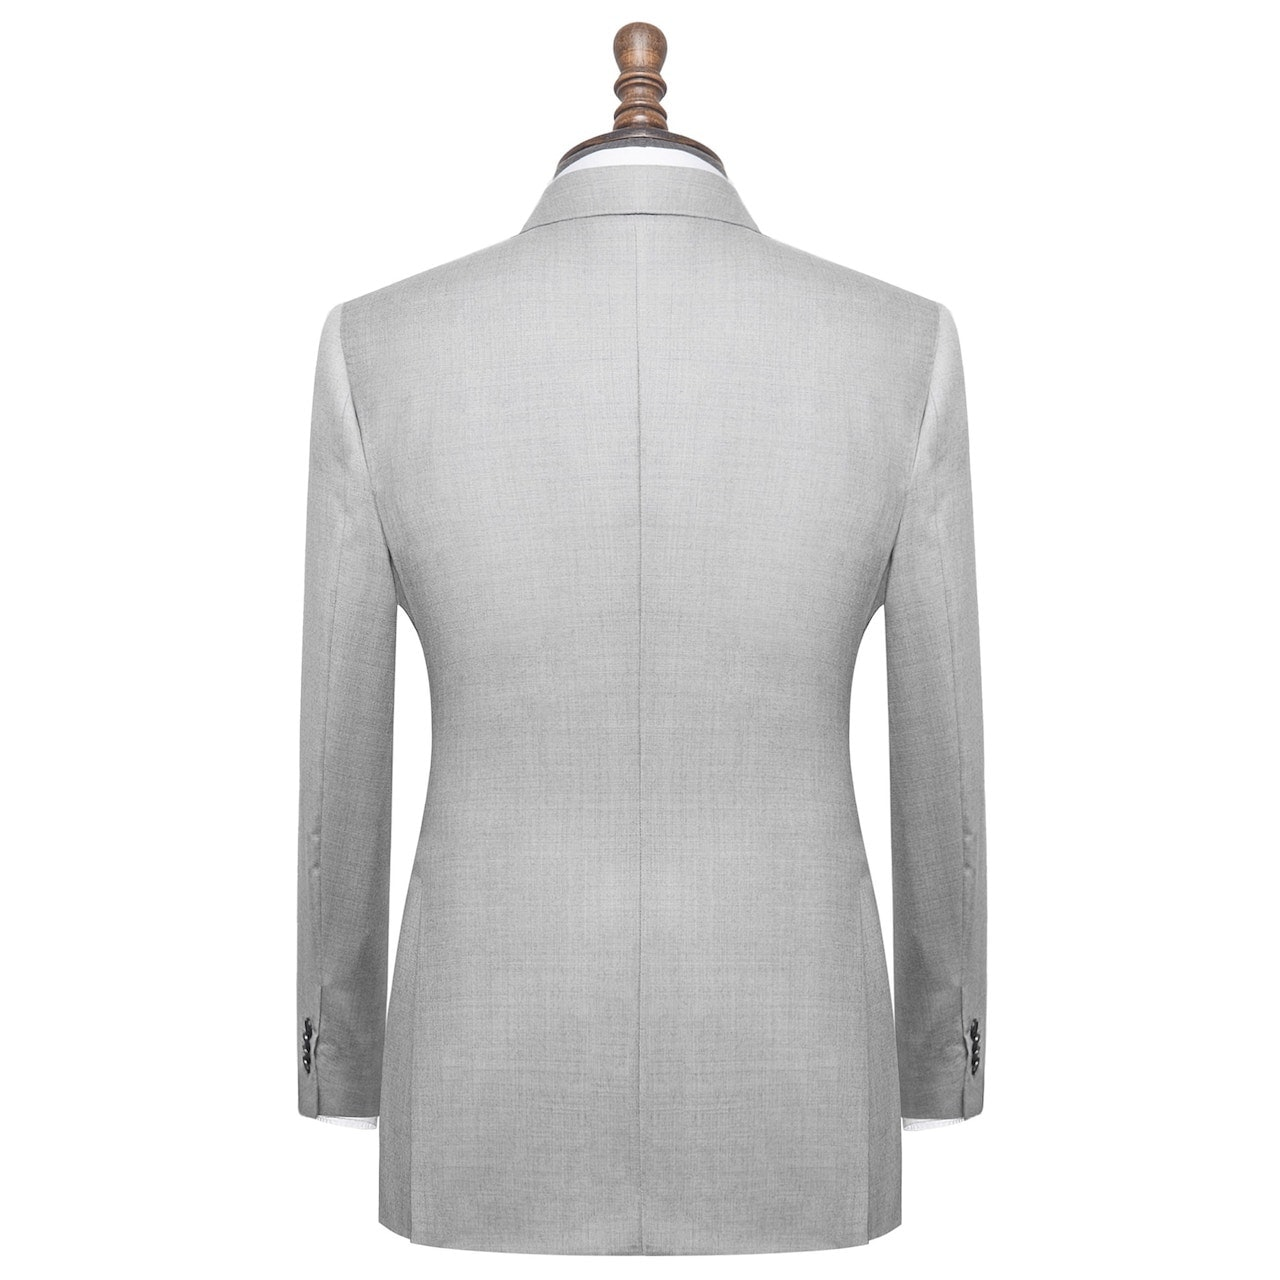 InStitchu Suit Fabric 149